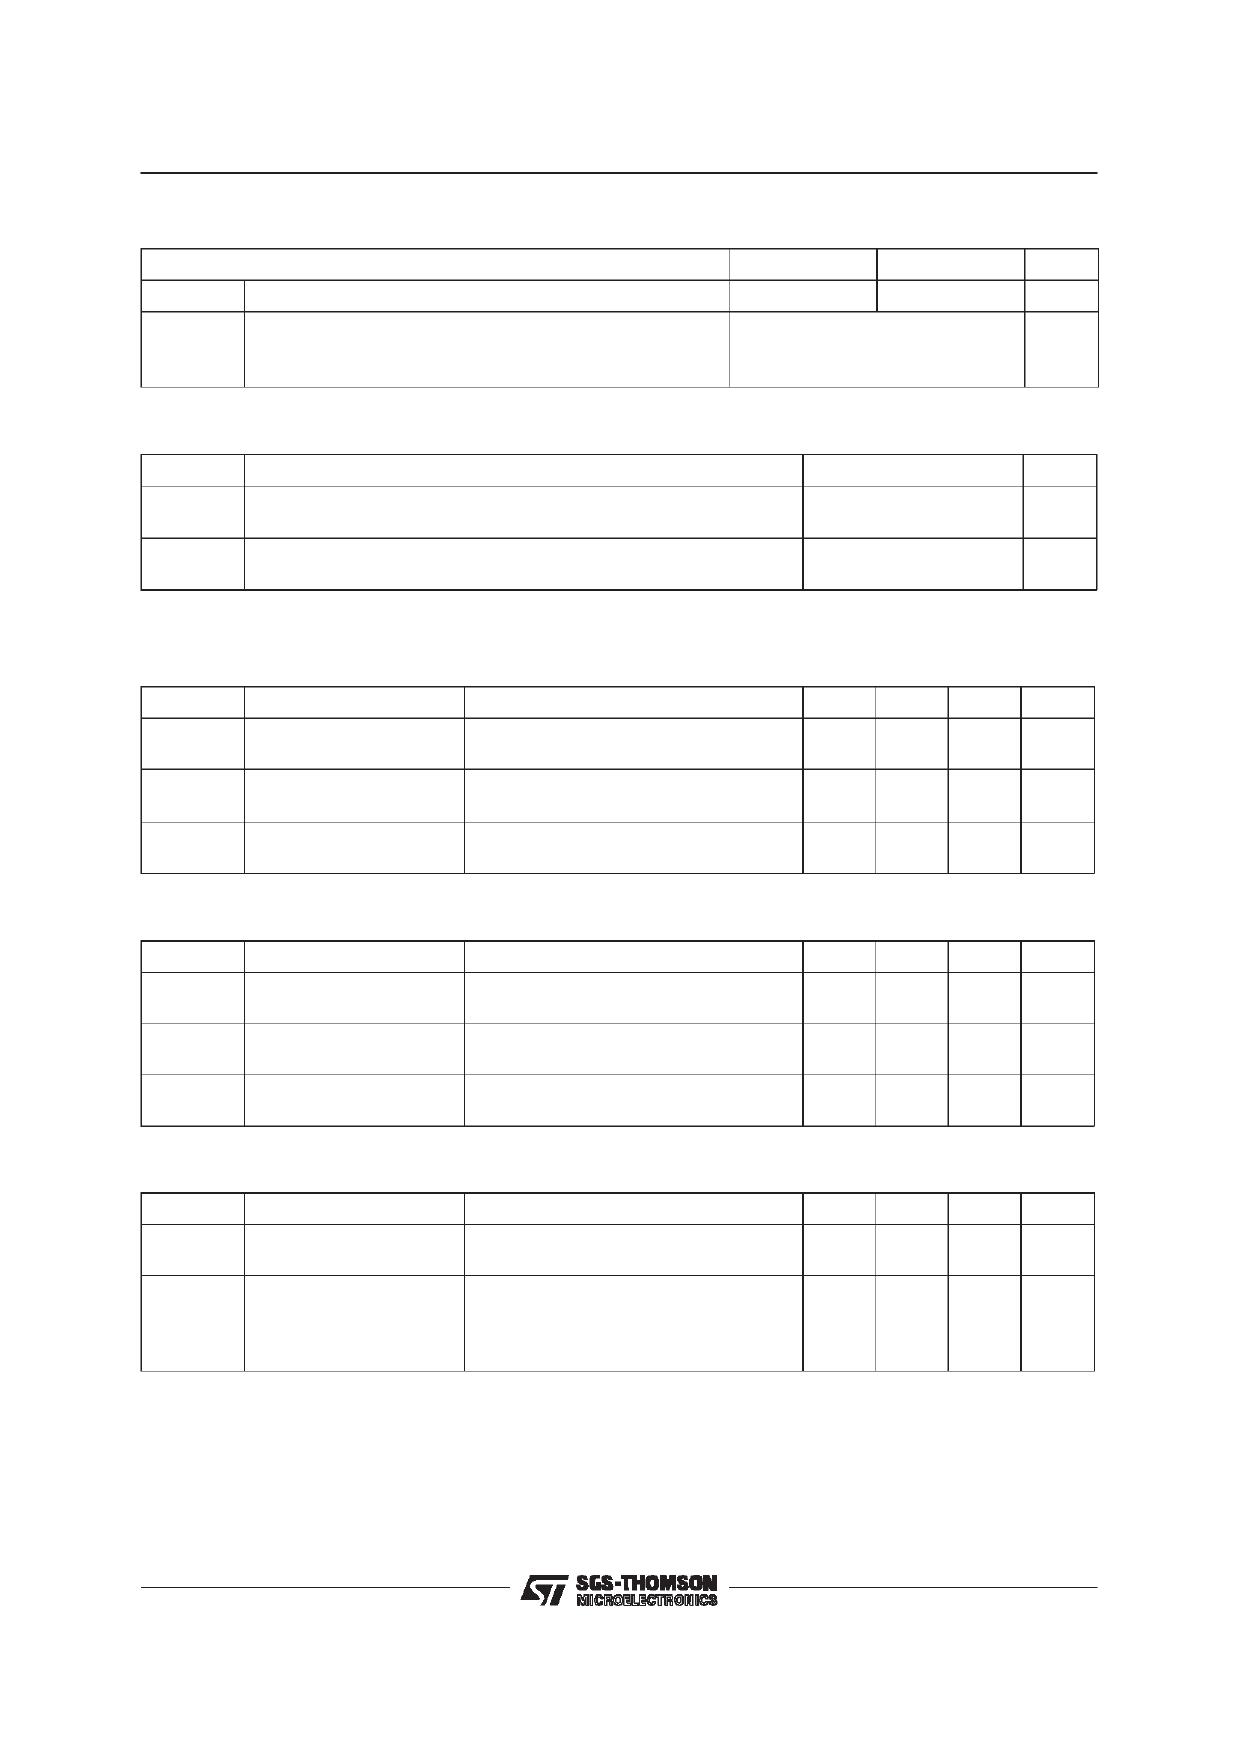 P12NB30FP pdf, schematic